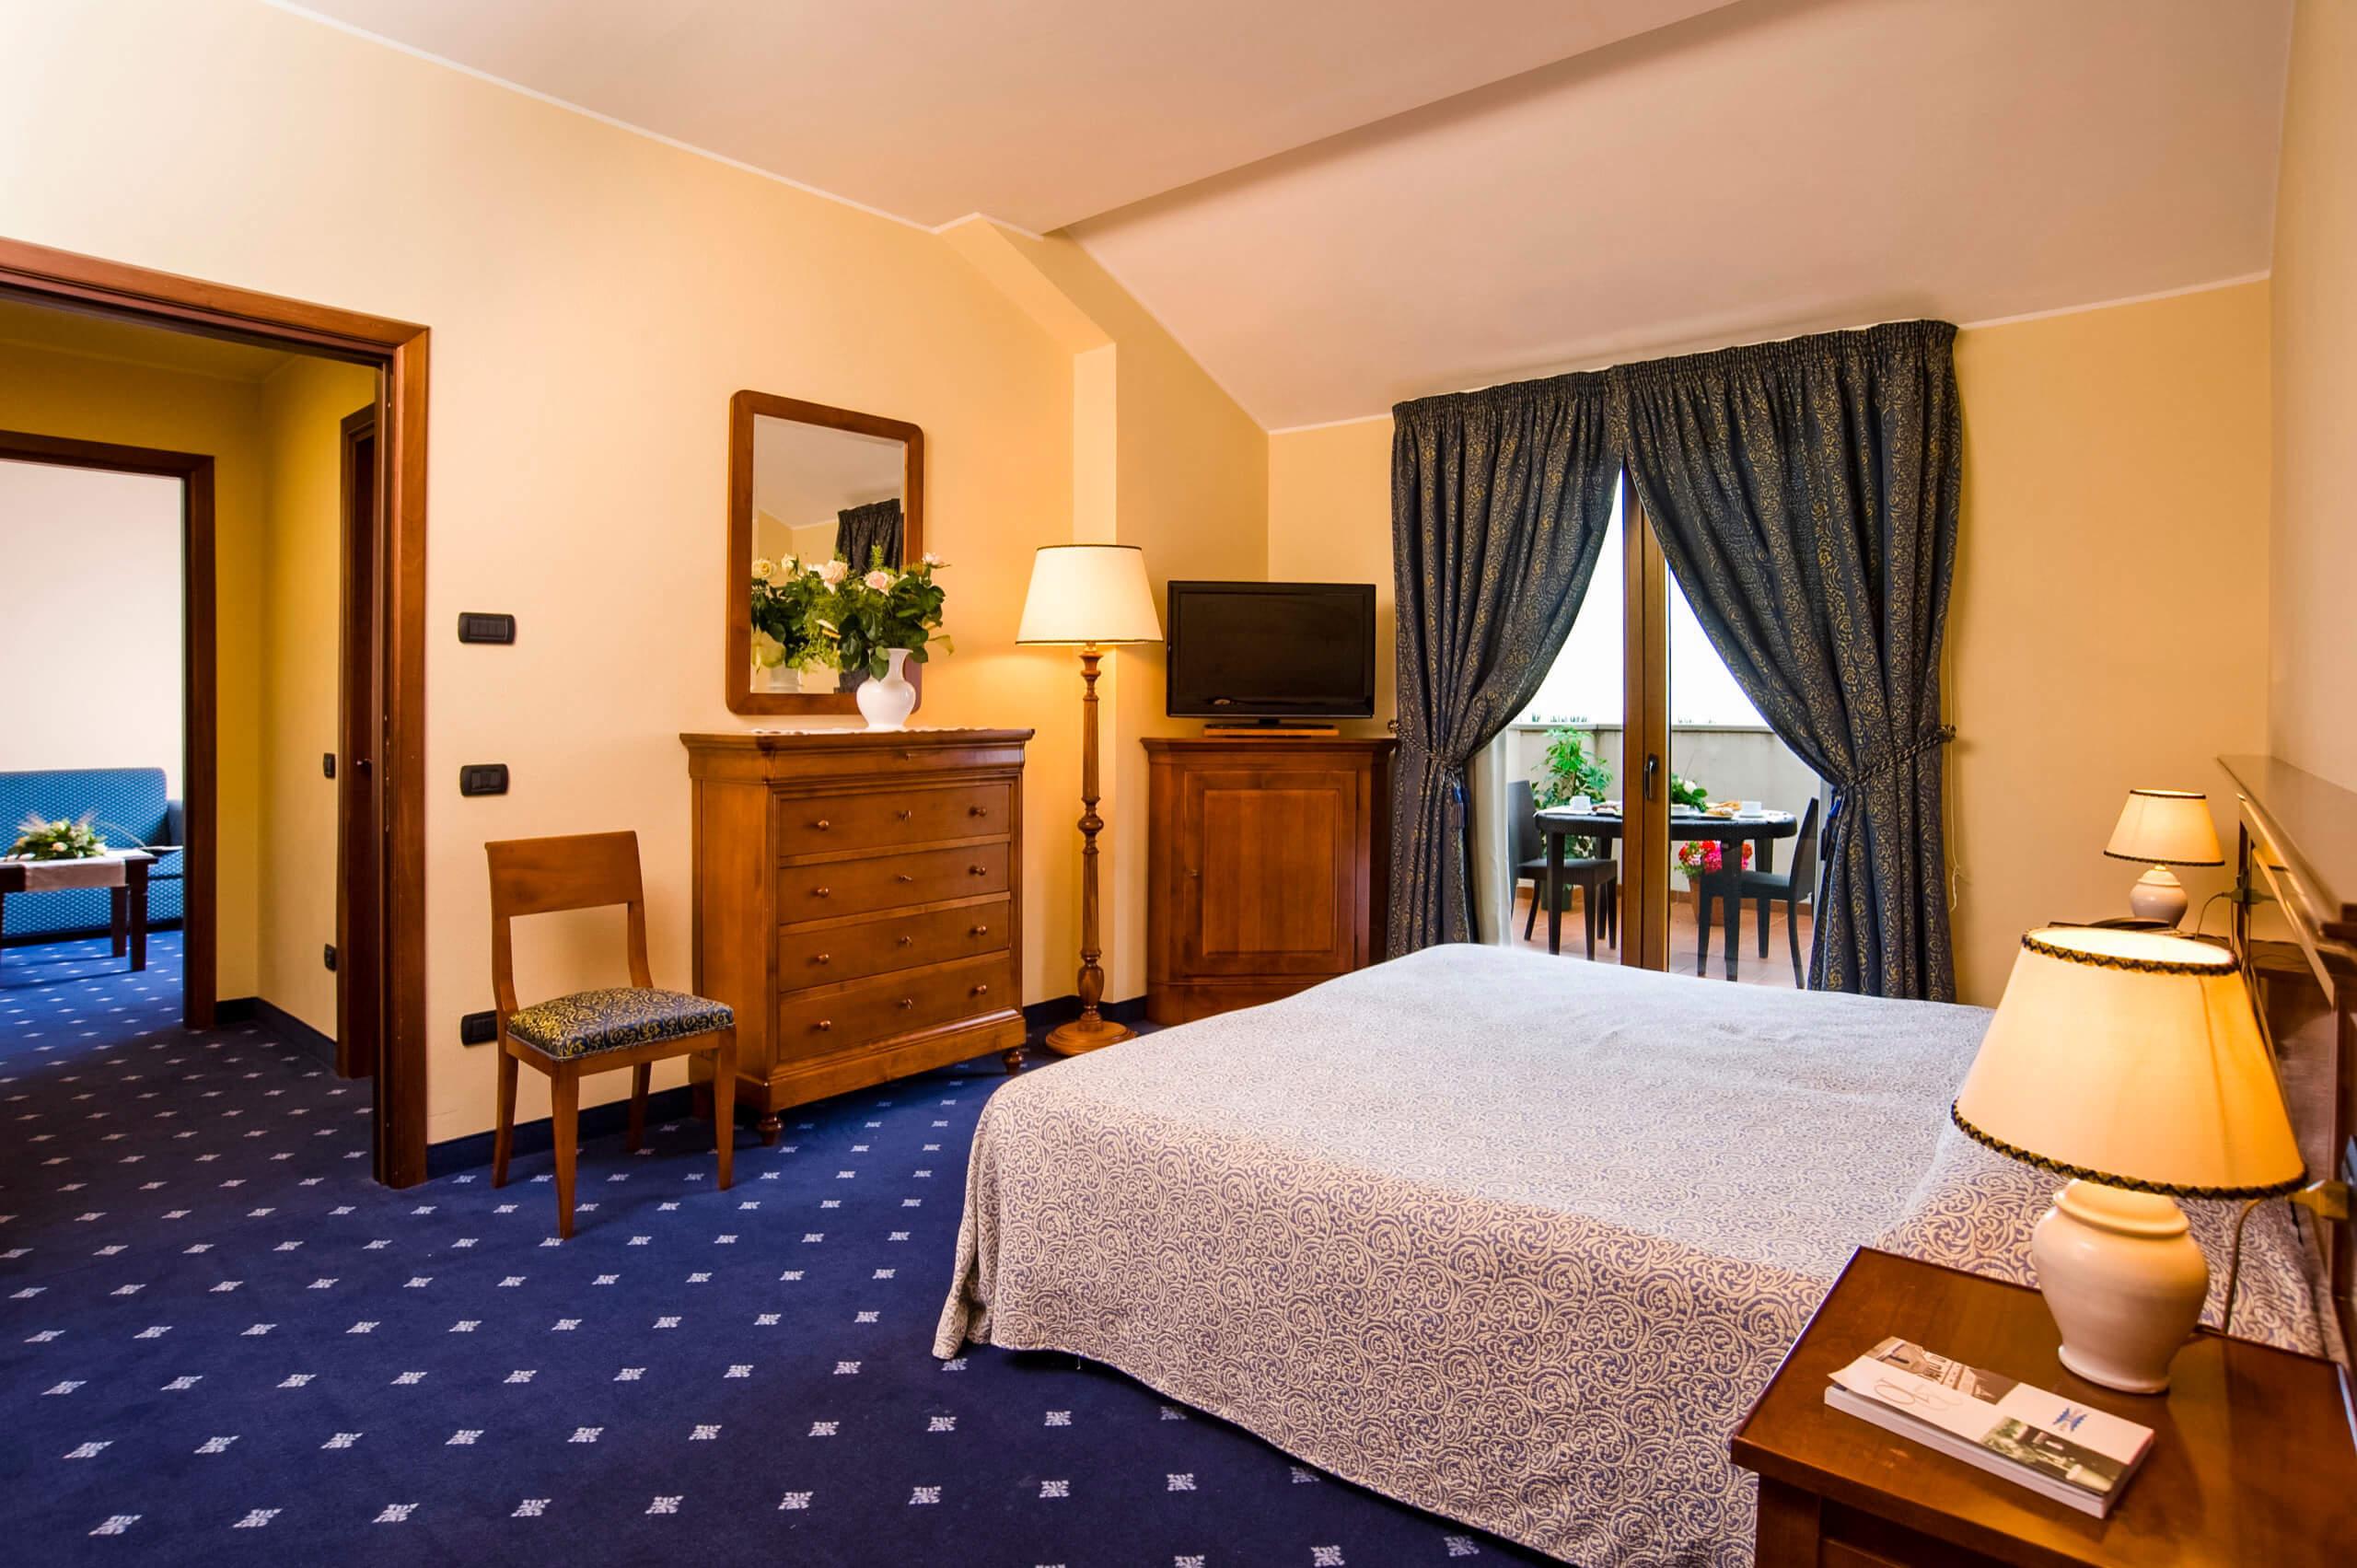 Hotel Spa Montalbano Elicona